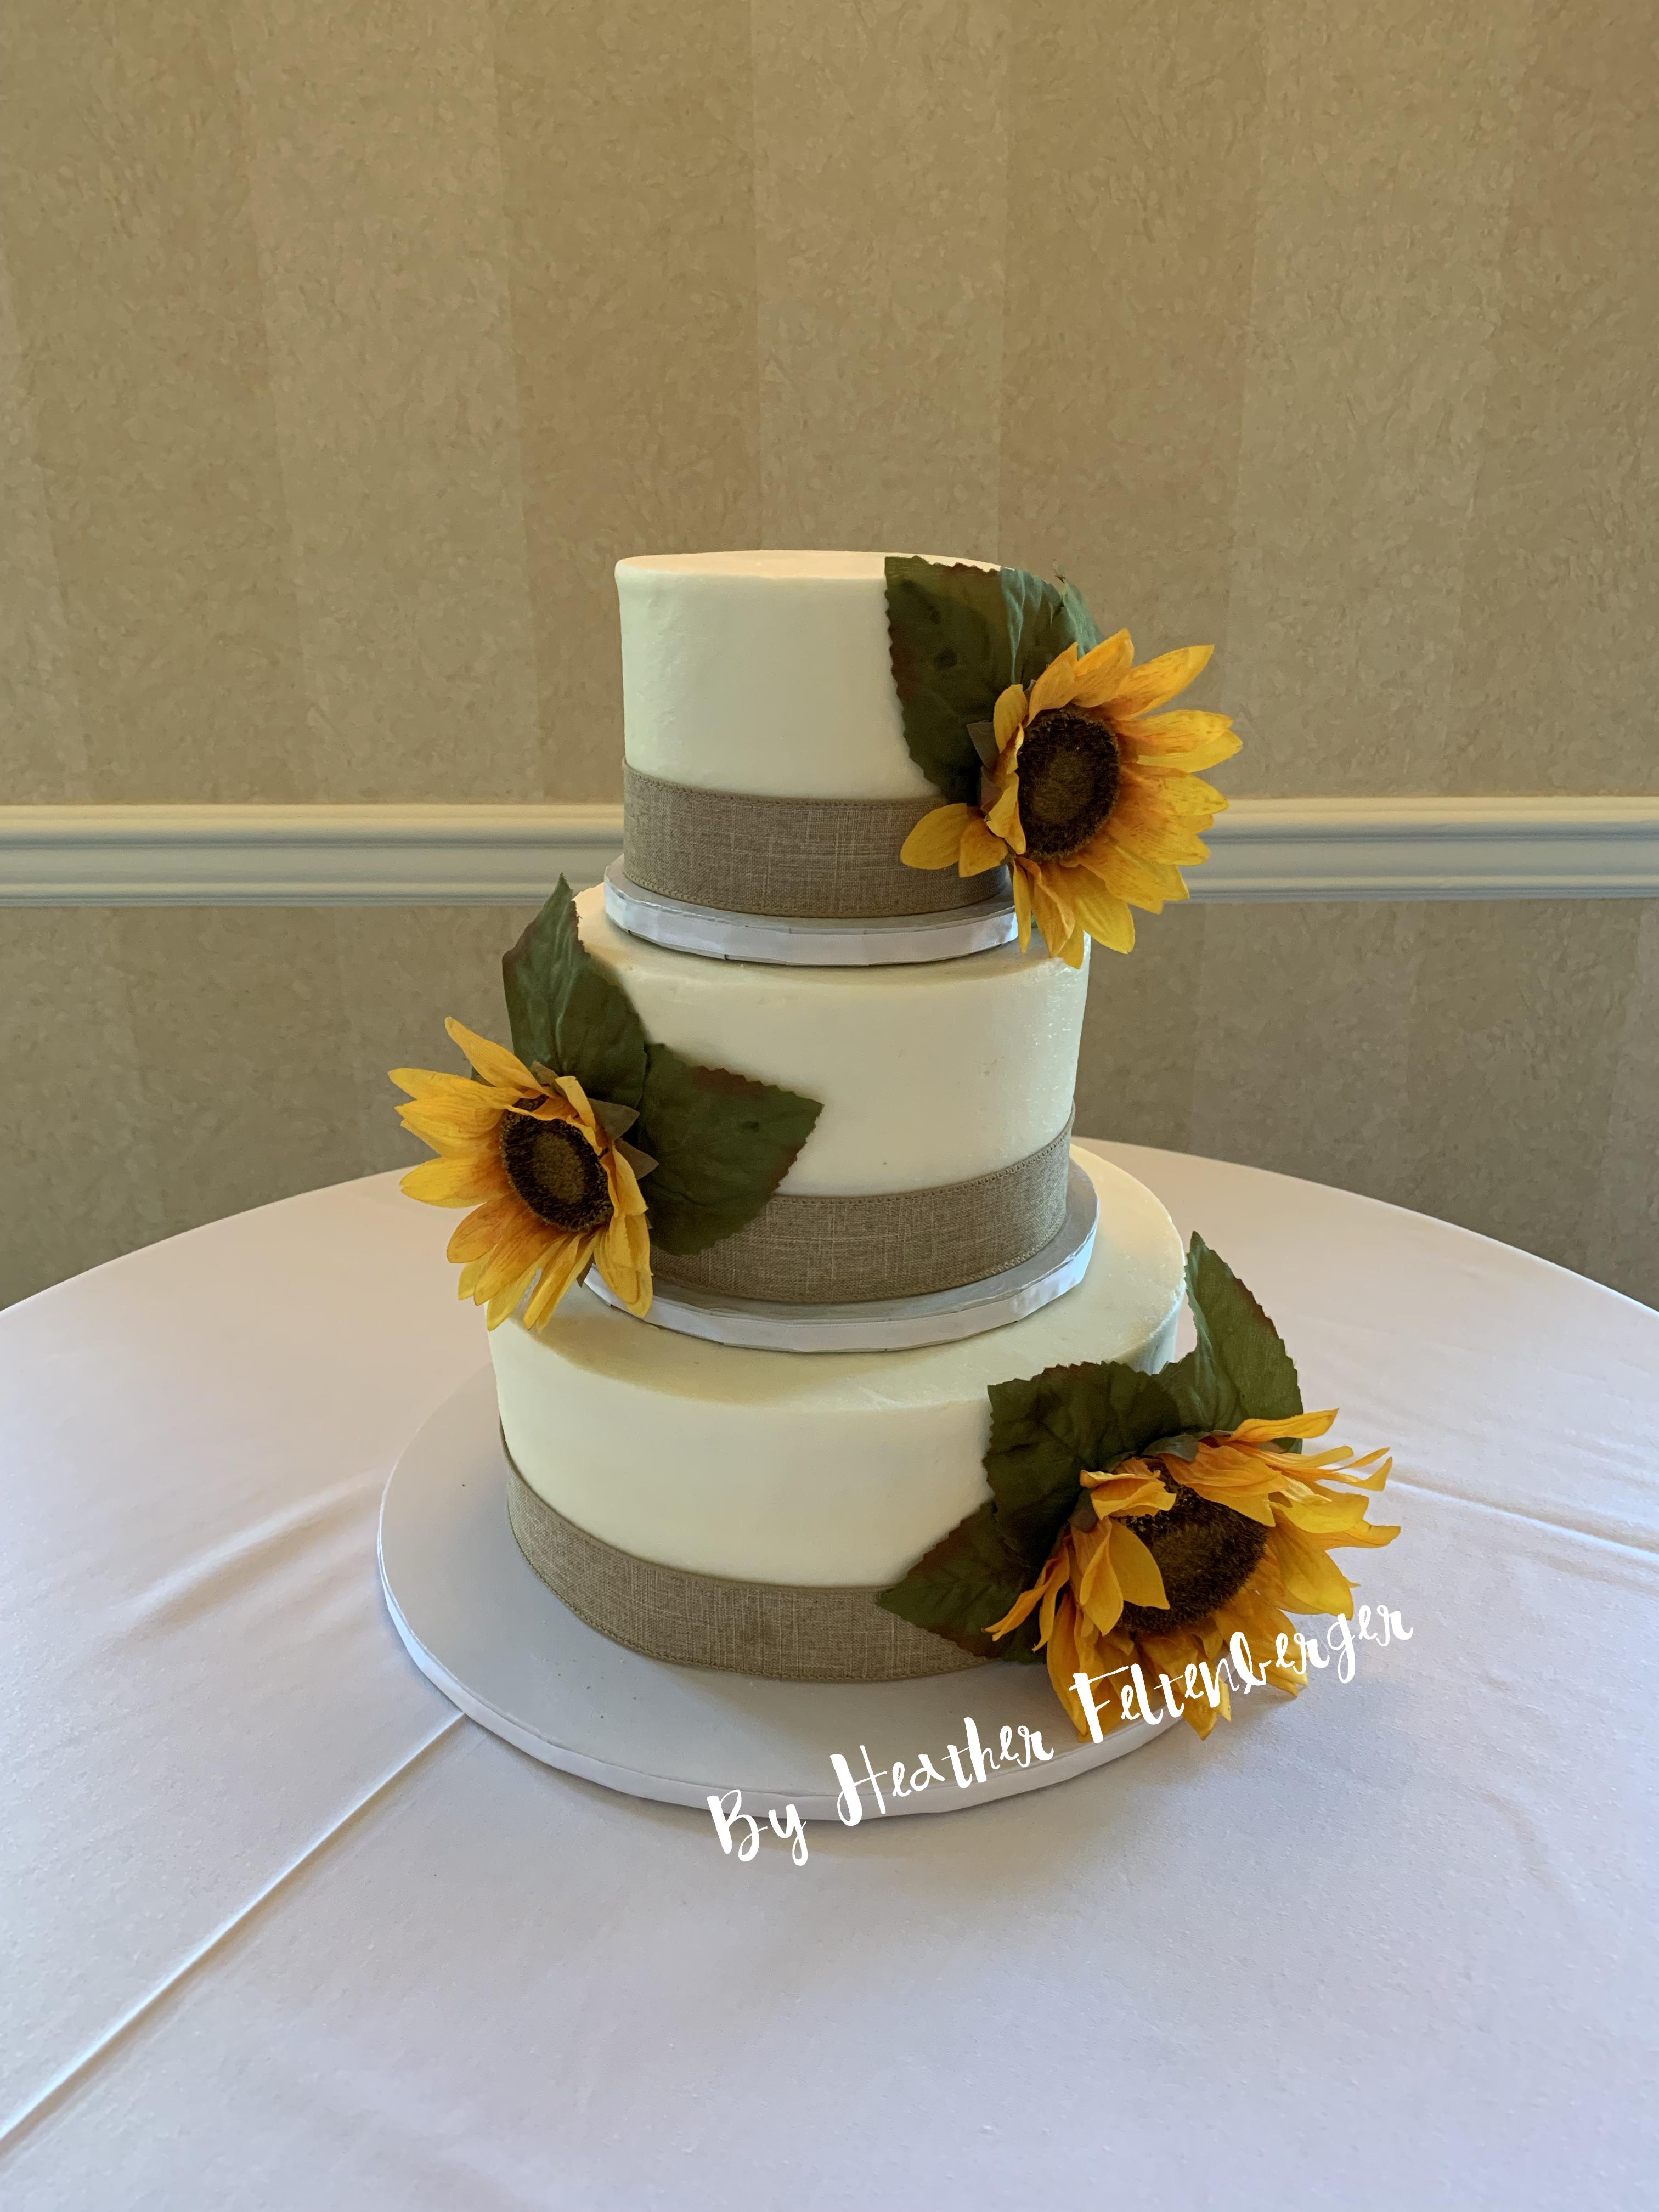 Sunflowers 3tier birthday cake in 2019 Cake, 3 tier